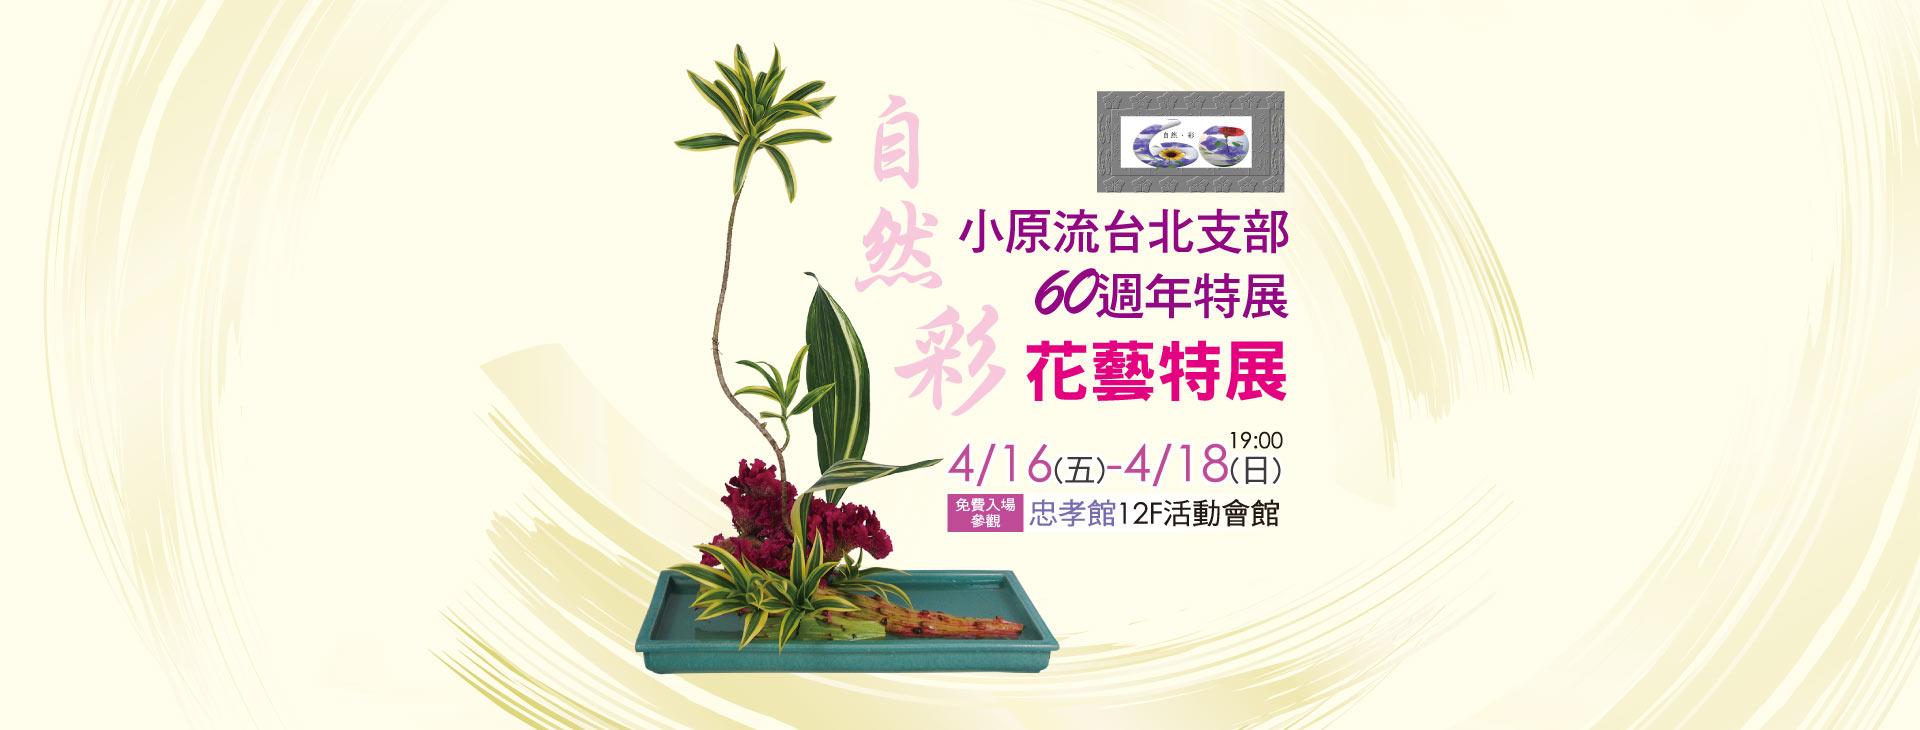 12F活動會館「小原流台北支部60週年特展 花藝特展 自然.彩」